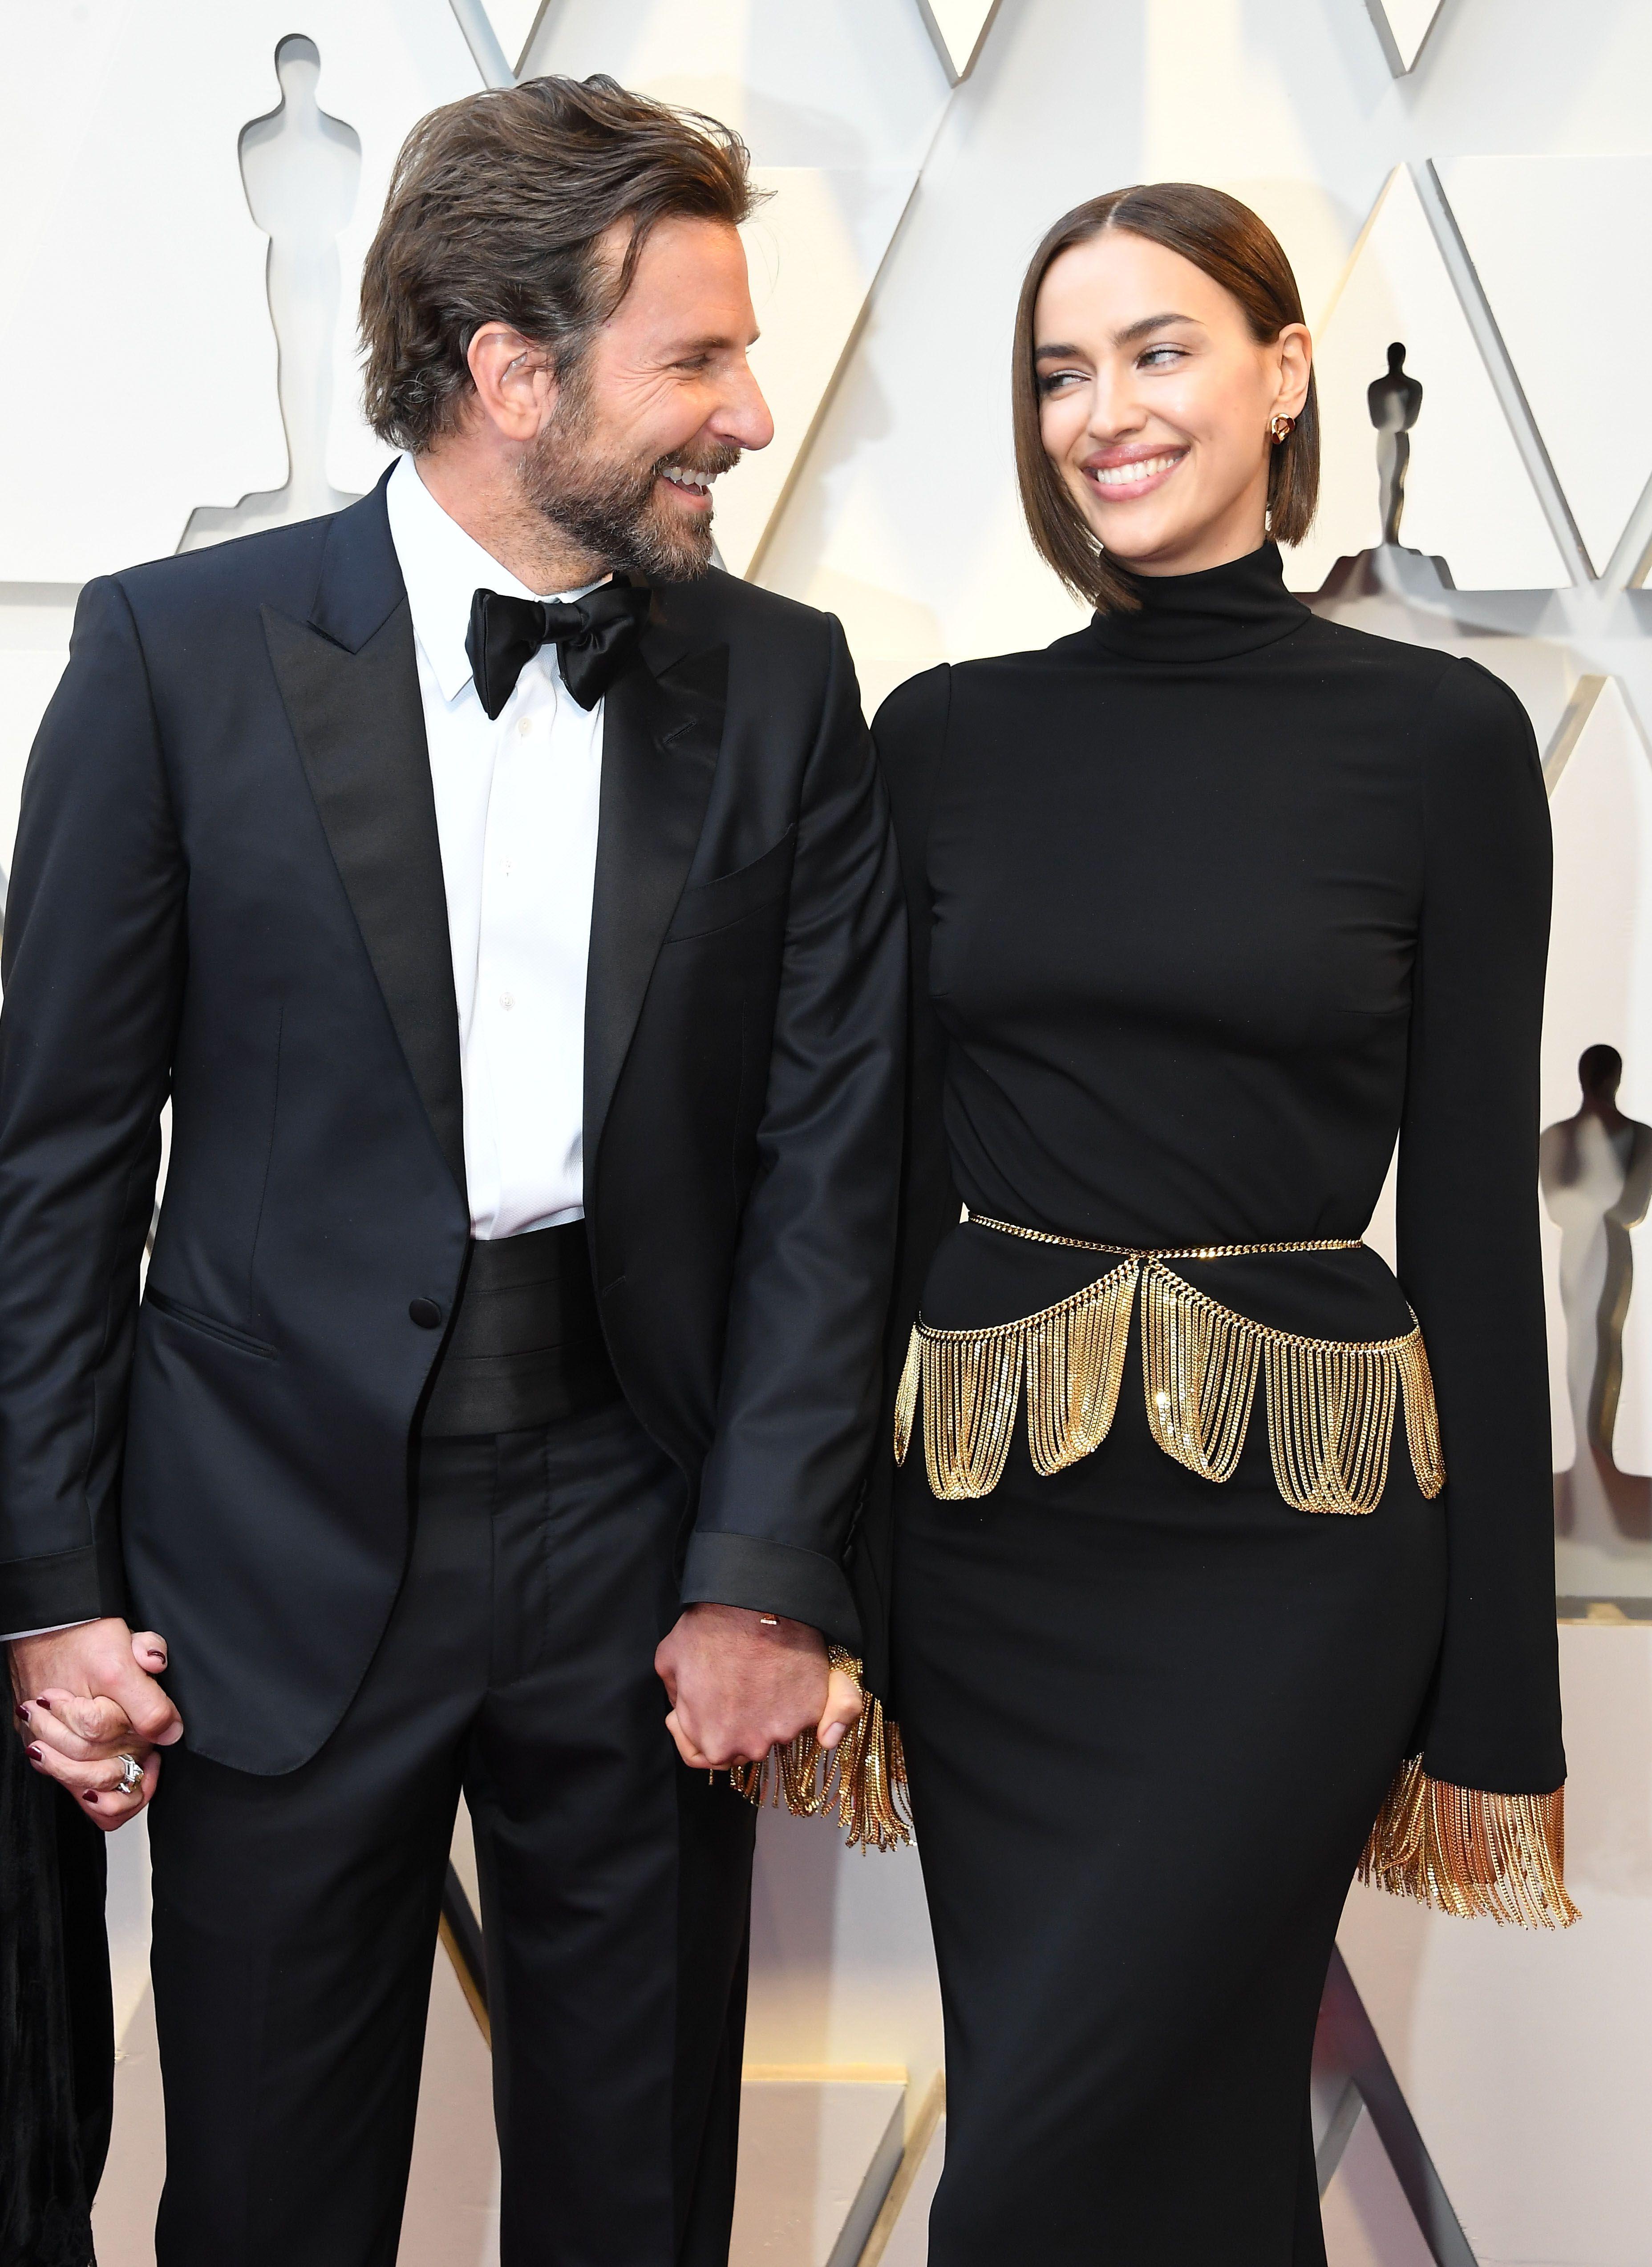 Jennifer Garner dating Bradley Cooper